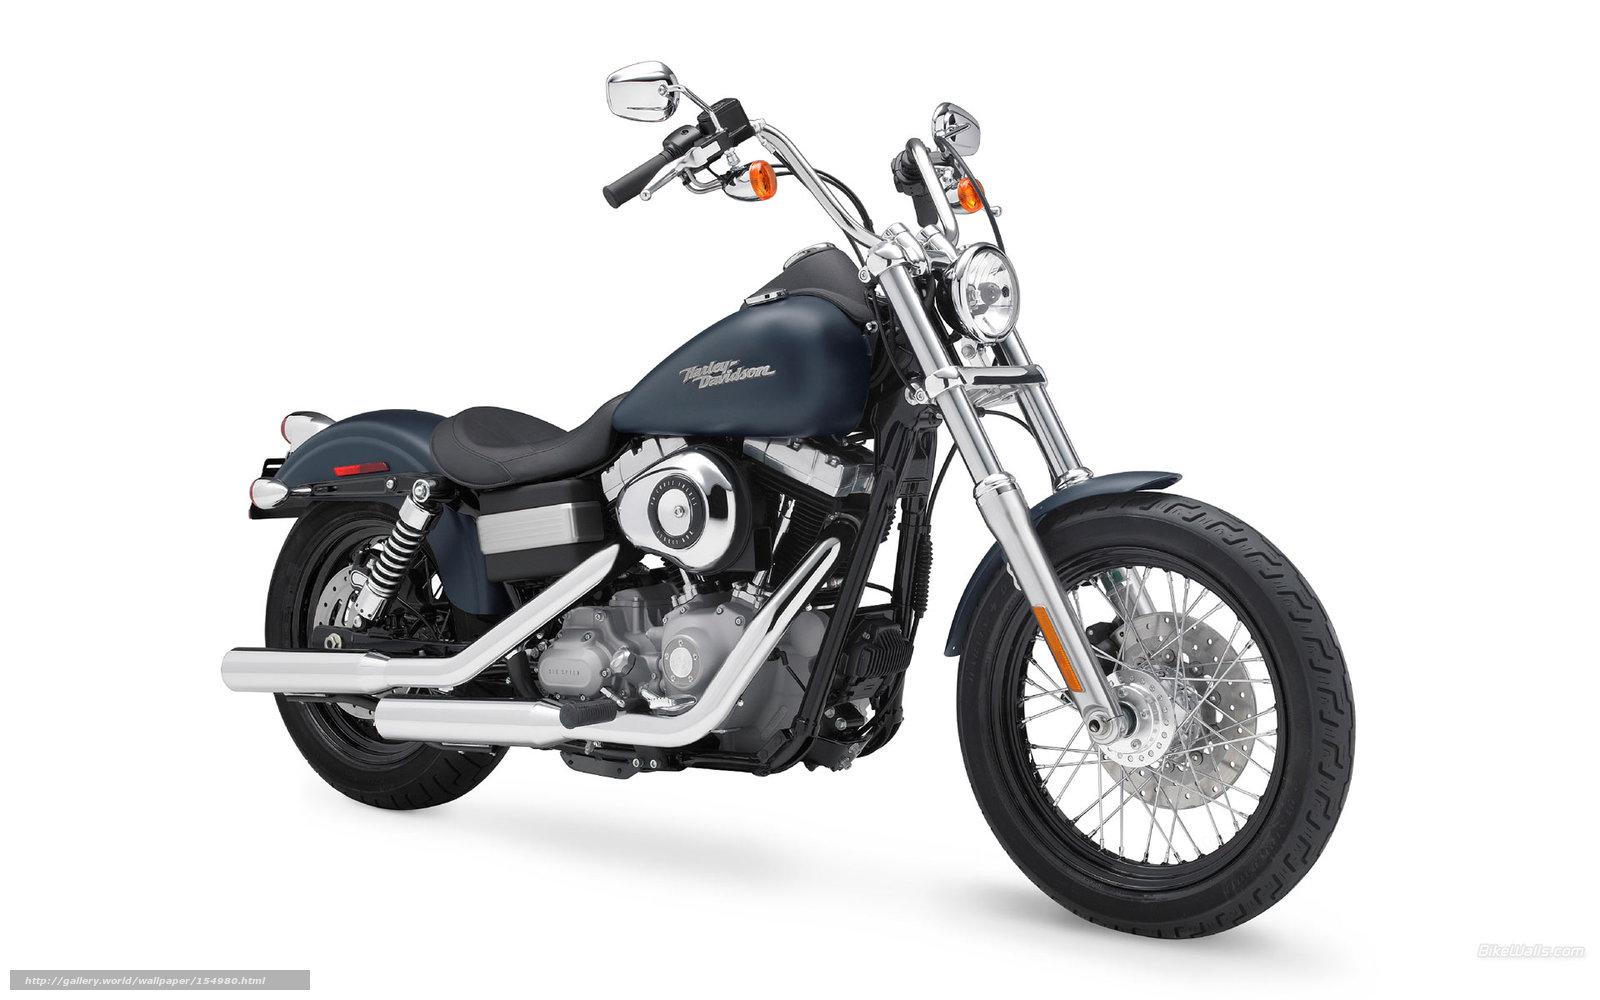 Download wallpaper Harley Davidson Dyna FXDB Dyna Street Bob FXDB 1600x1000